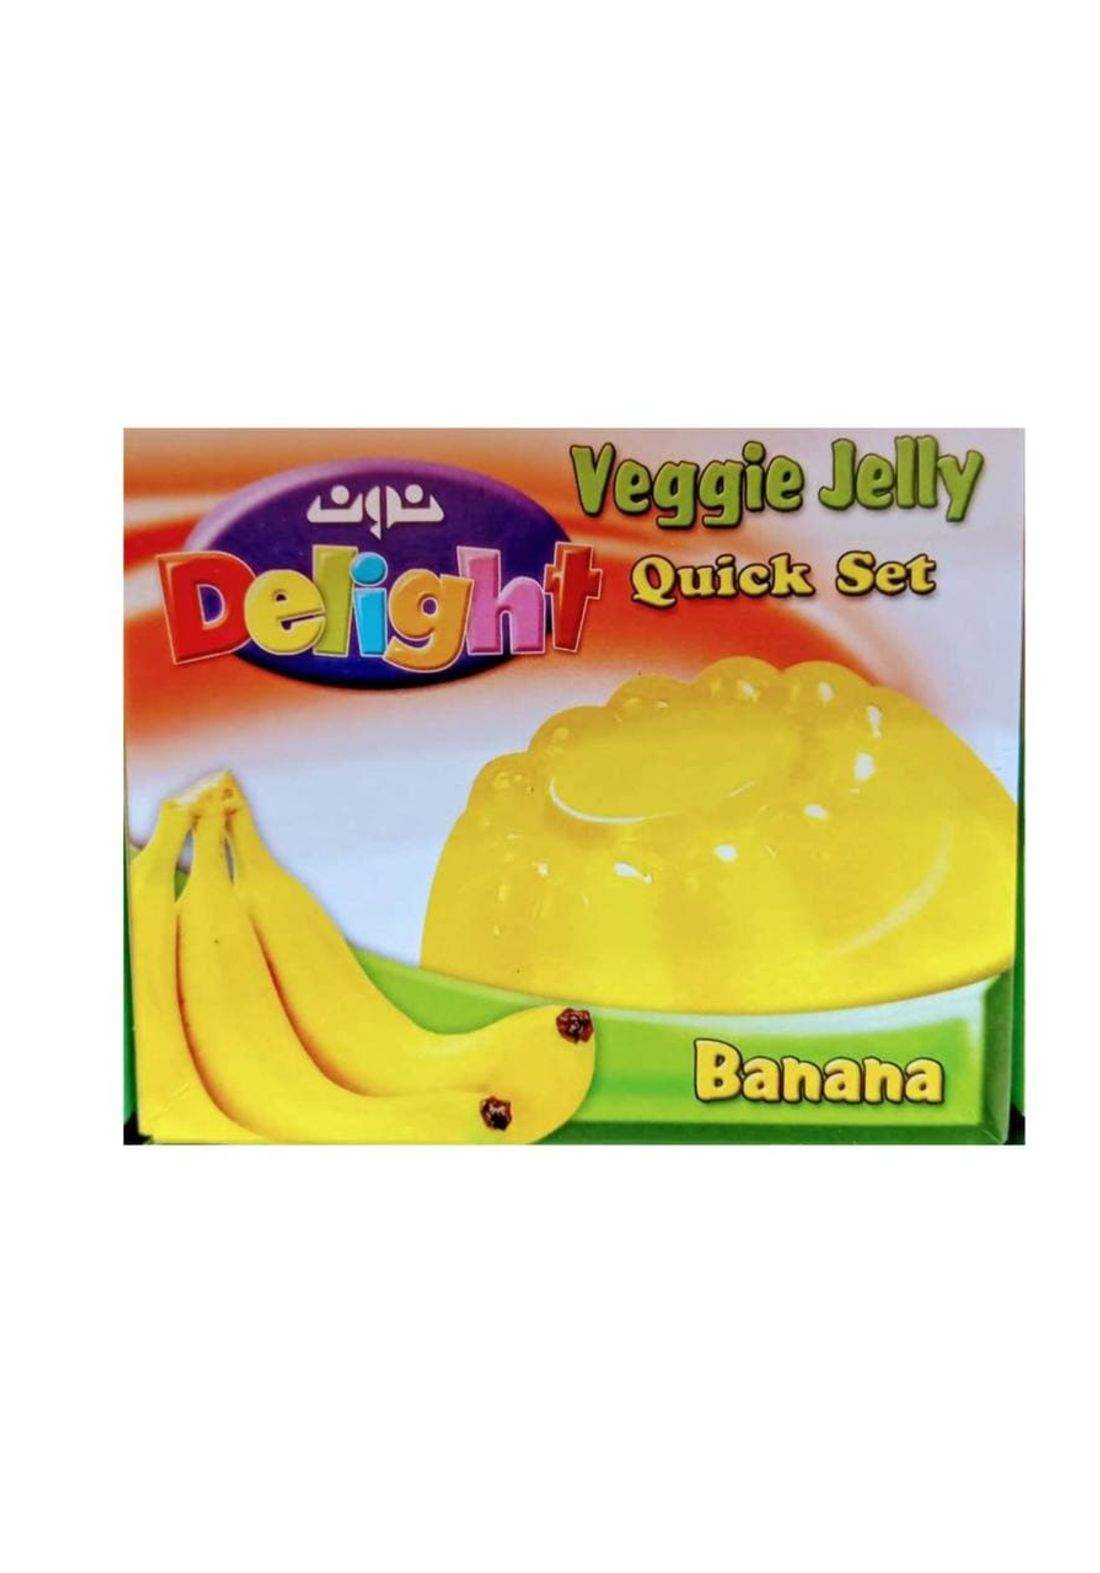 Delight veggie jelly ديلايت جلي نباتي